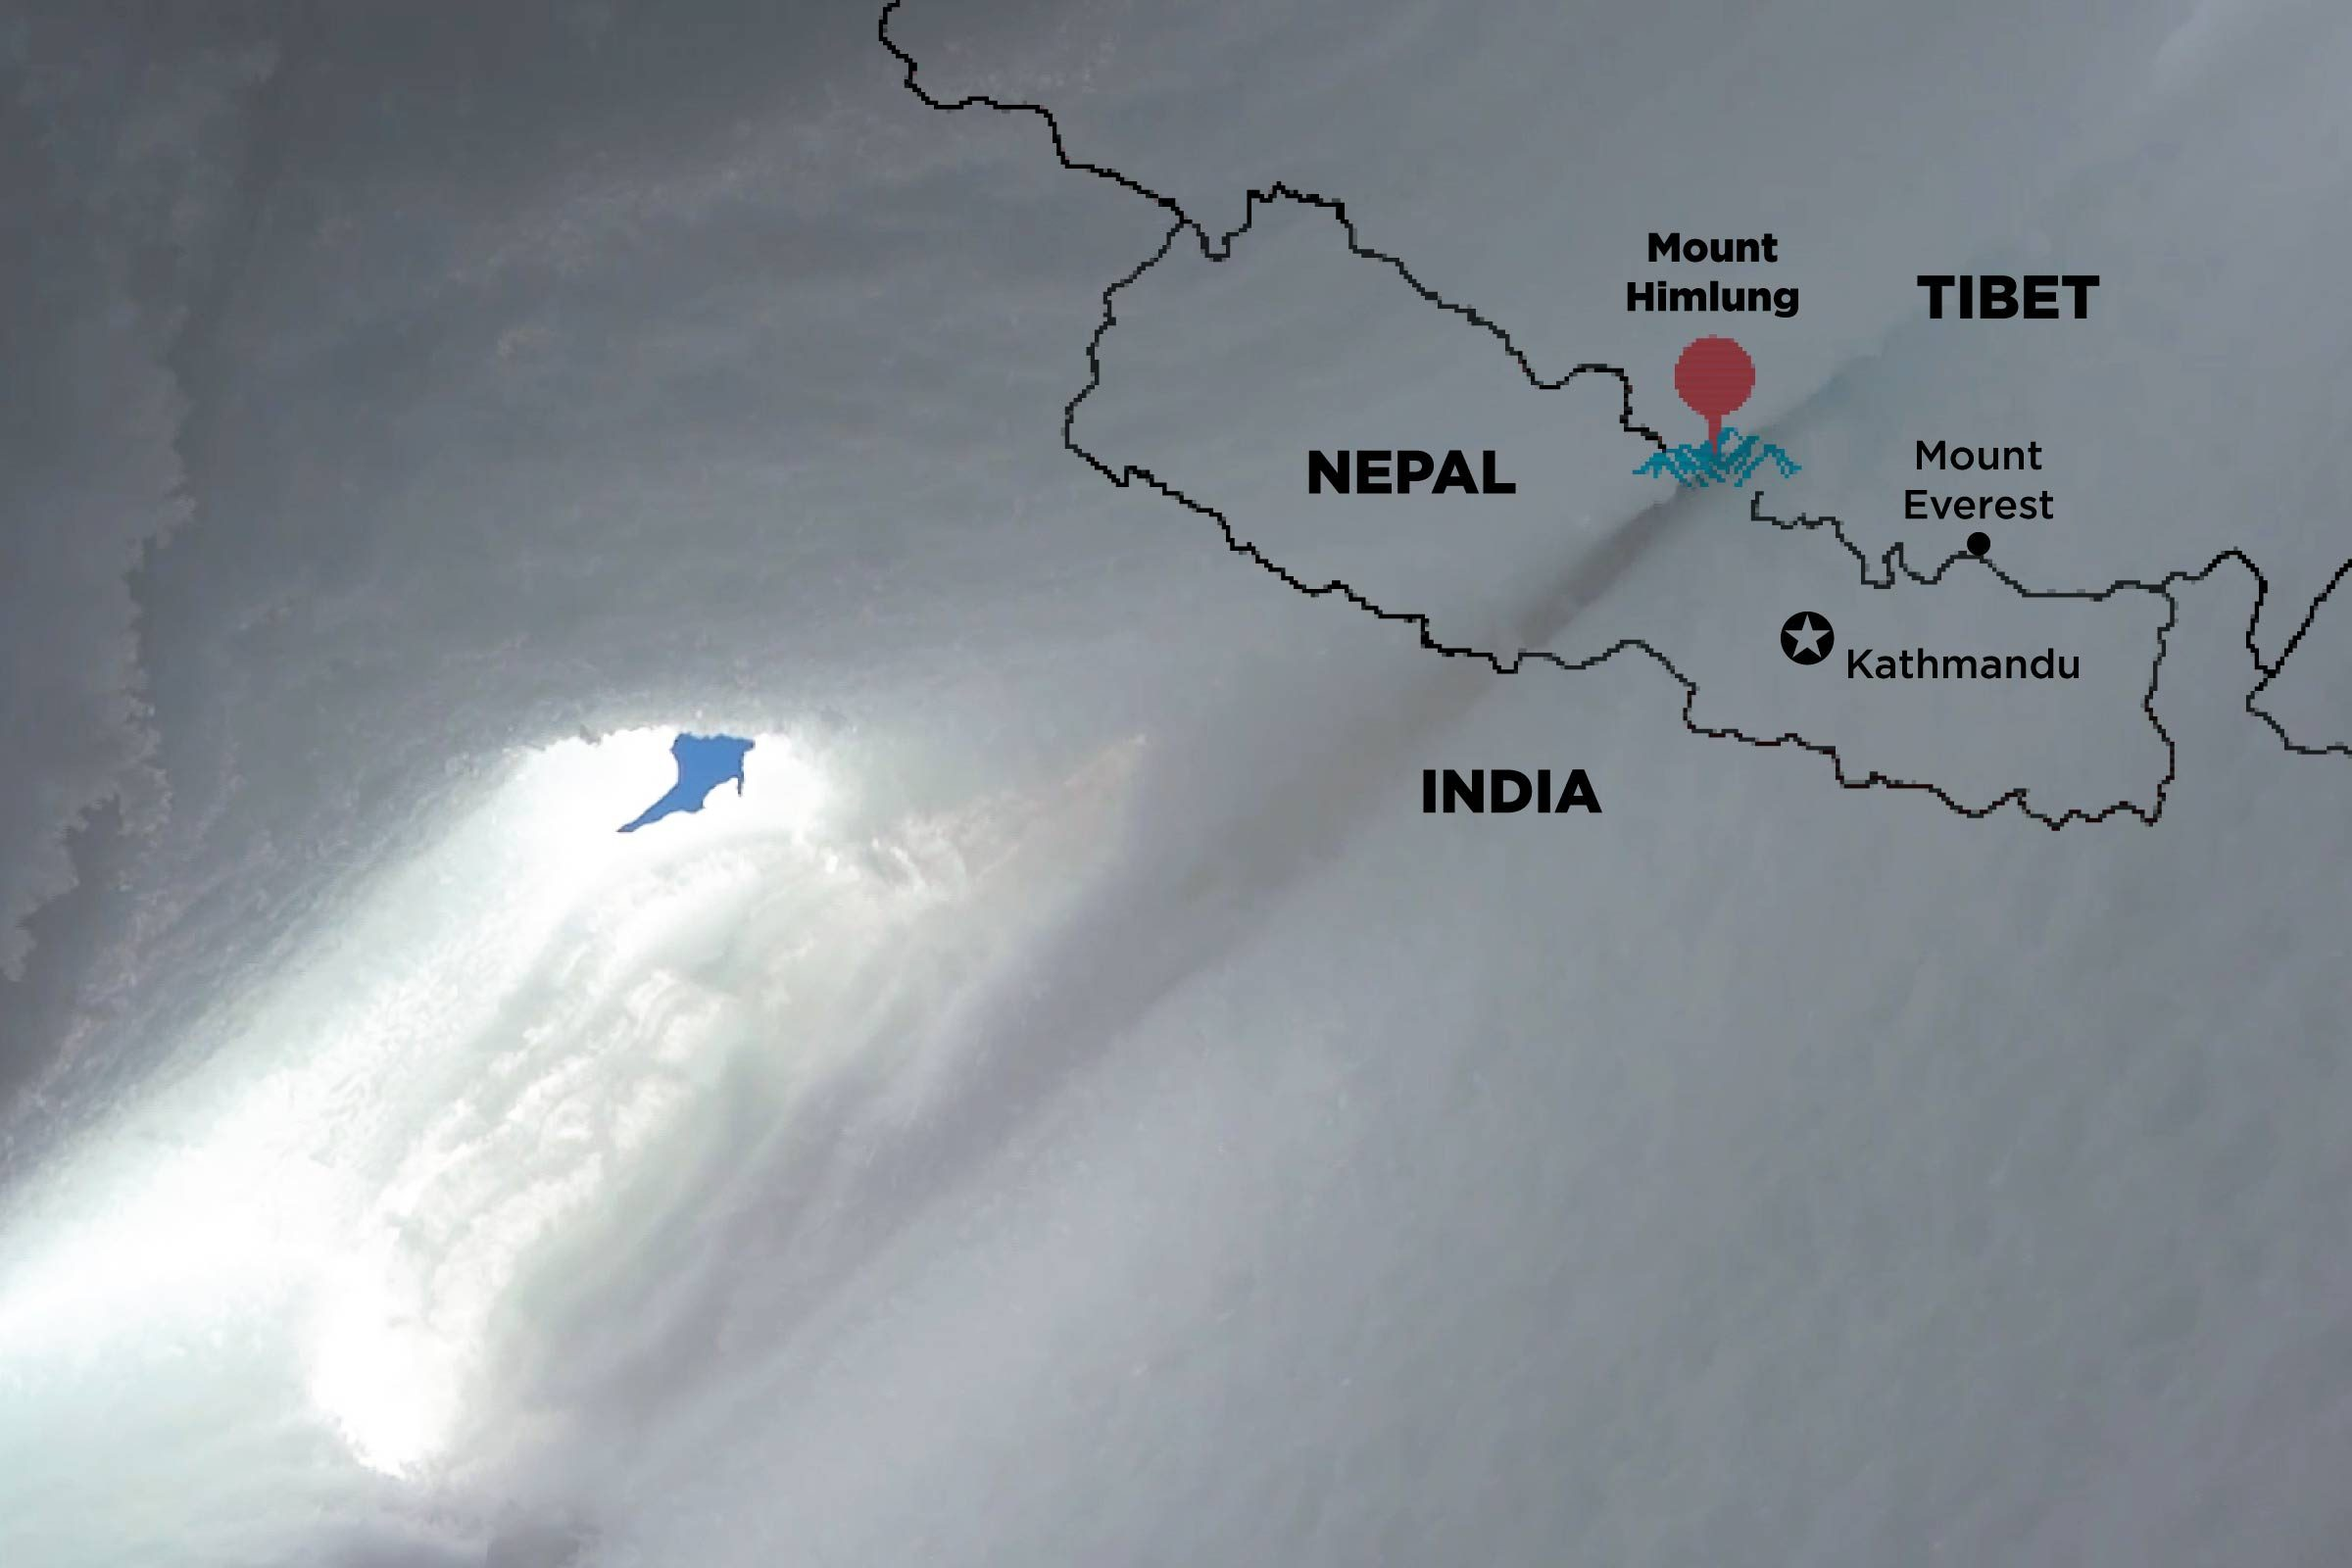 map of Mount Himlung